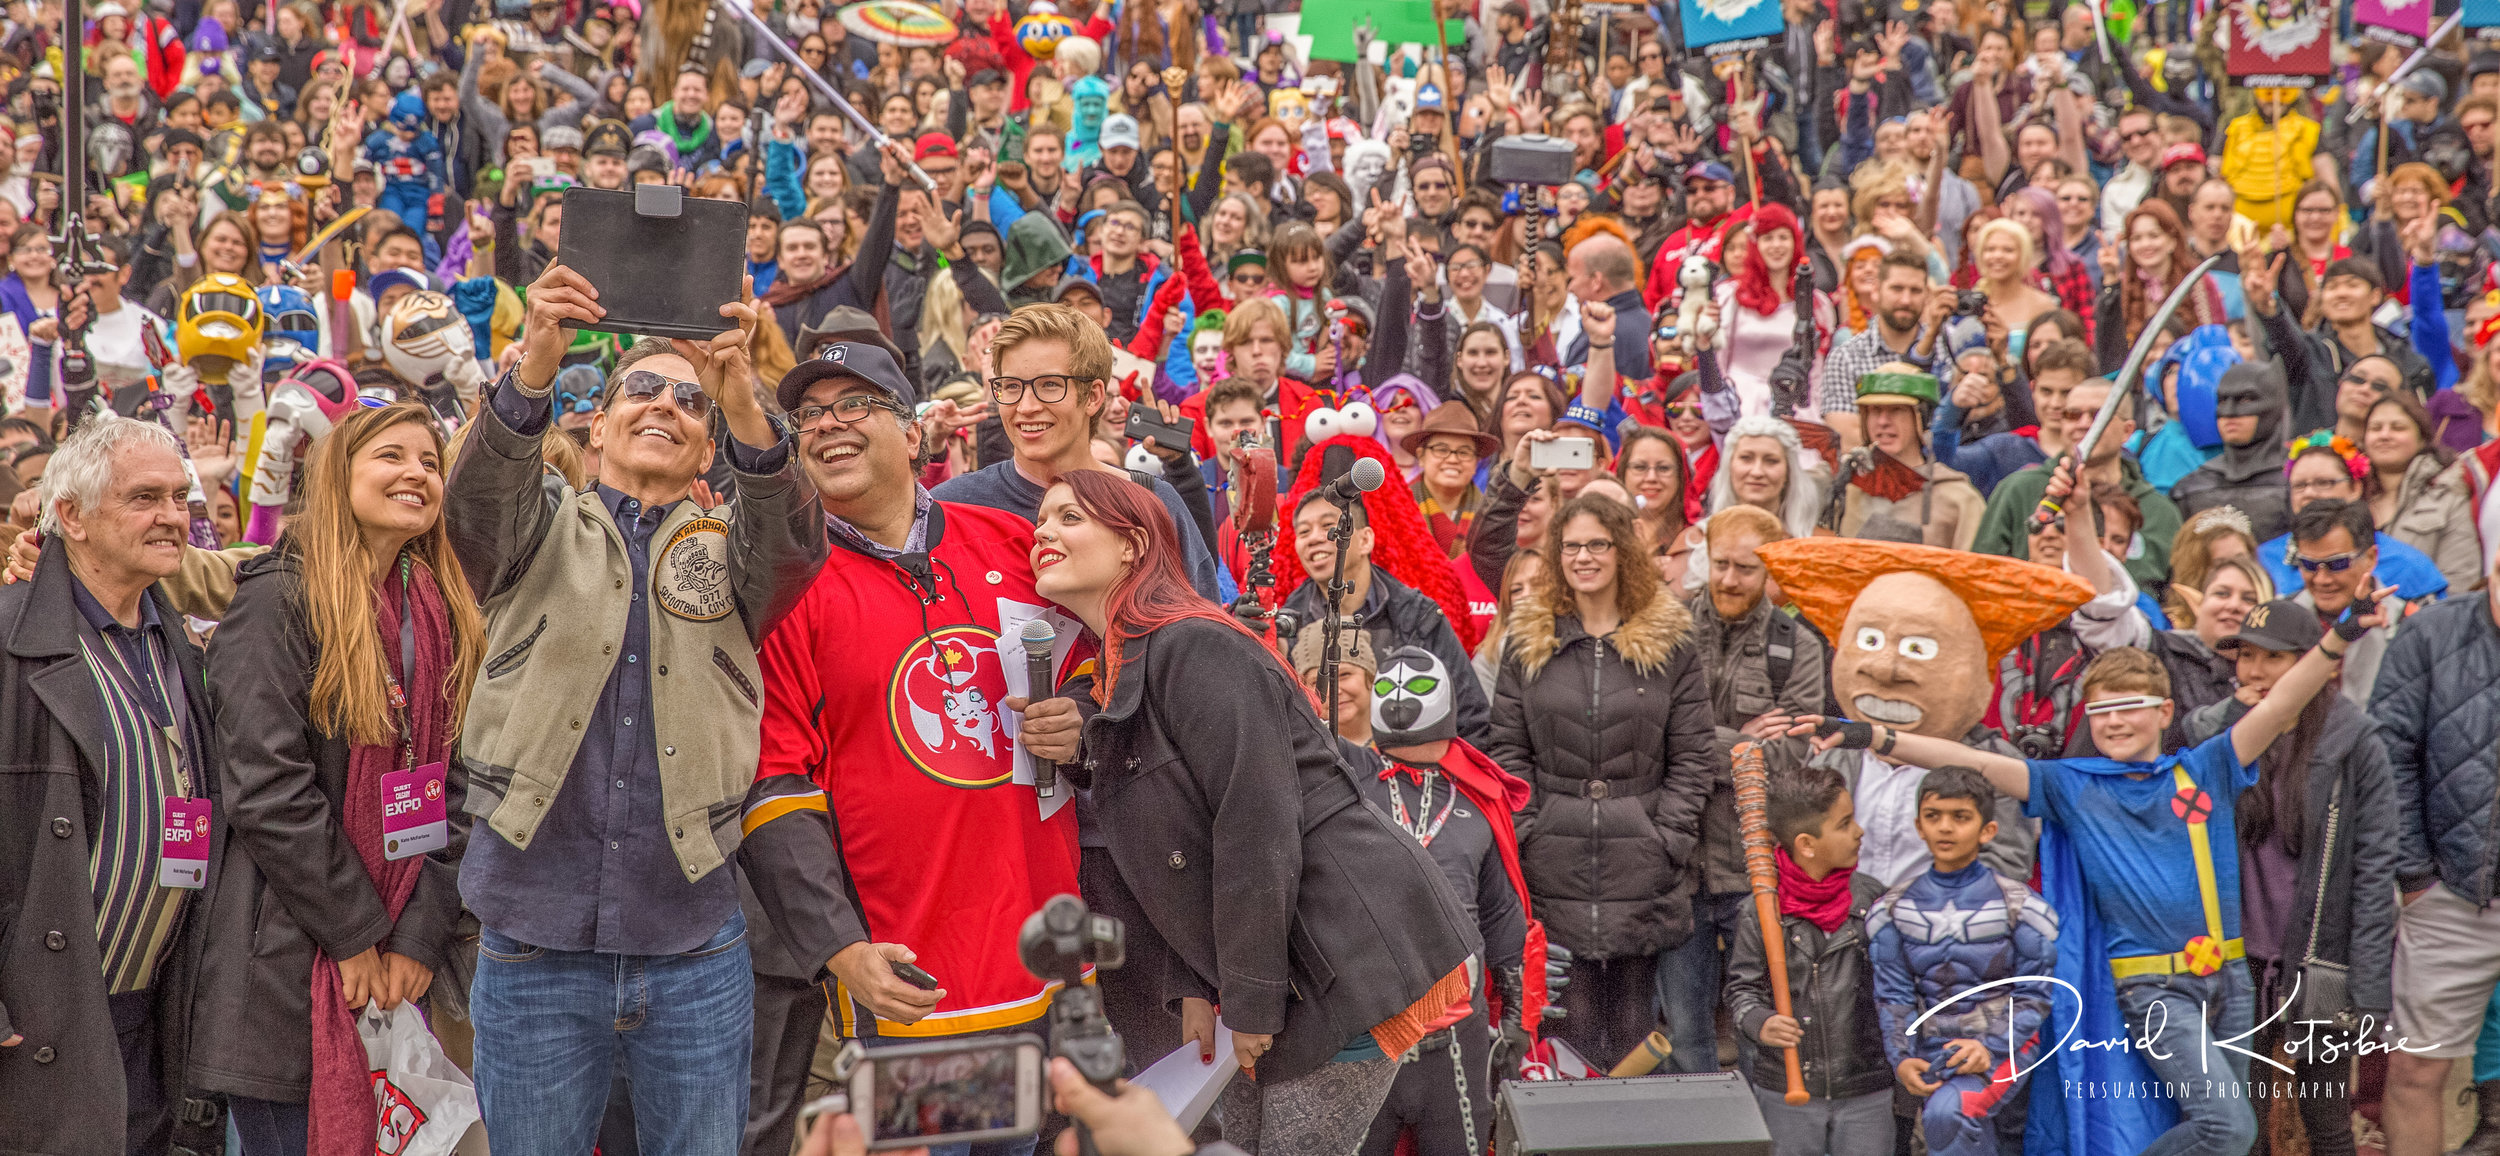 Calgary Comic Expo - Mayor Nenshi & Spawn creator Todd McFarlane